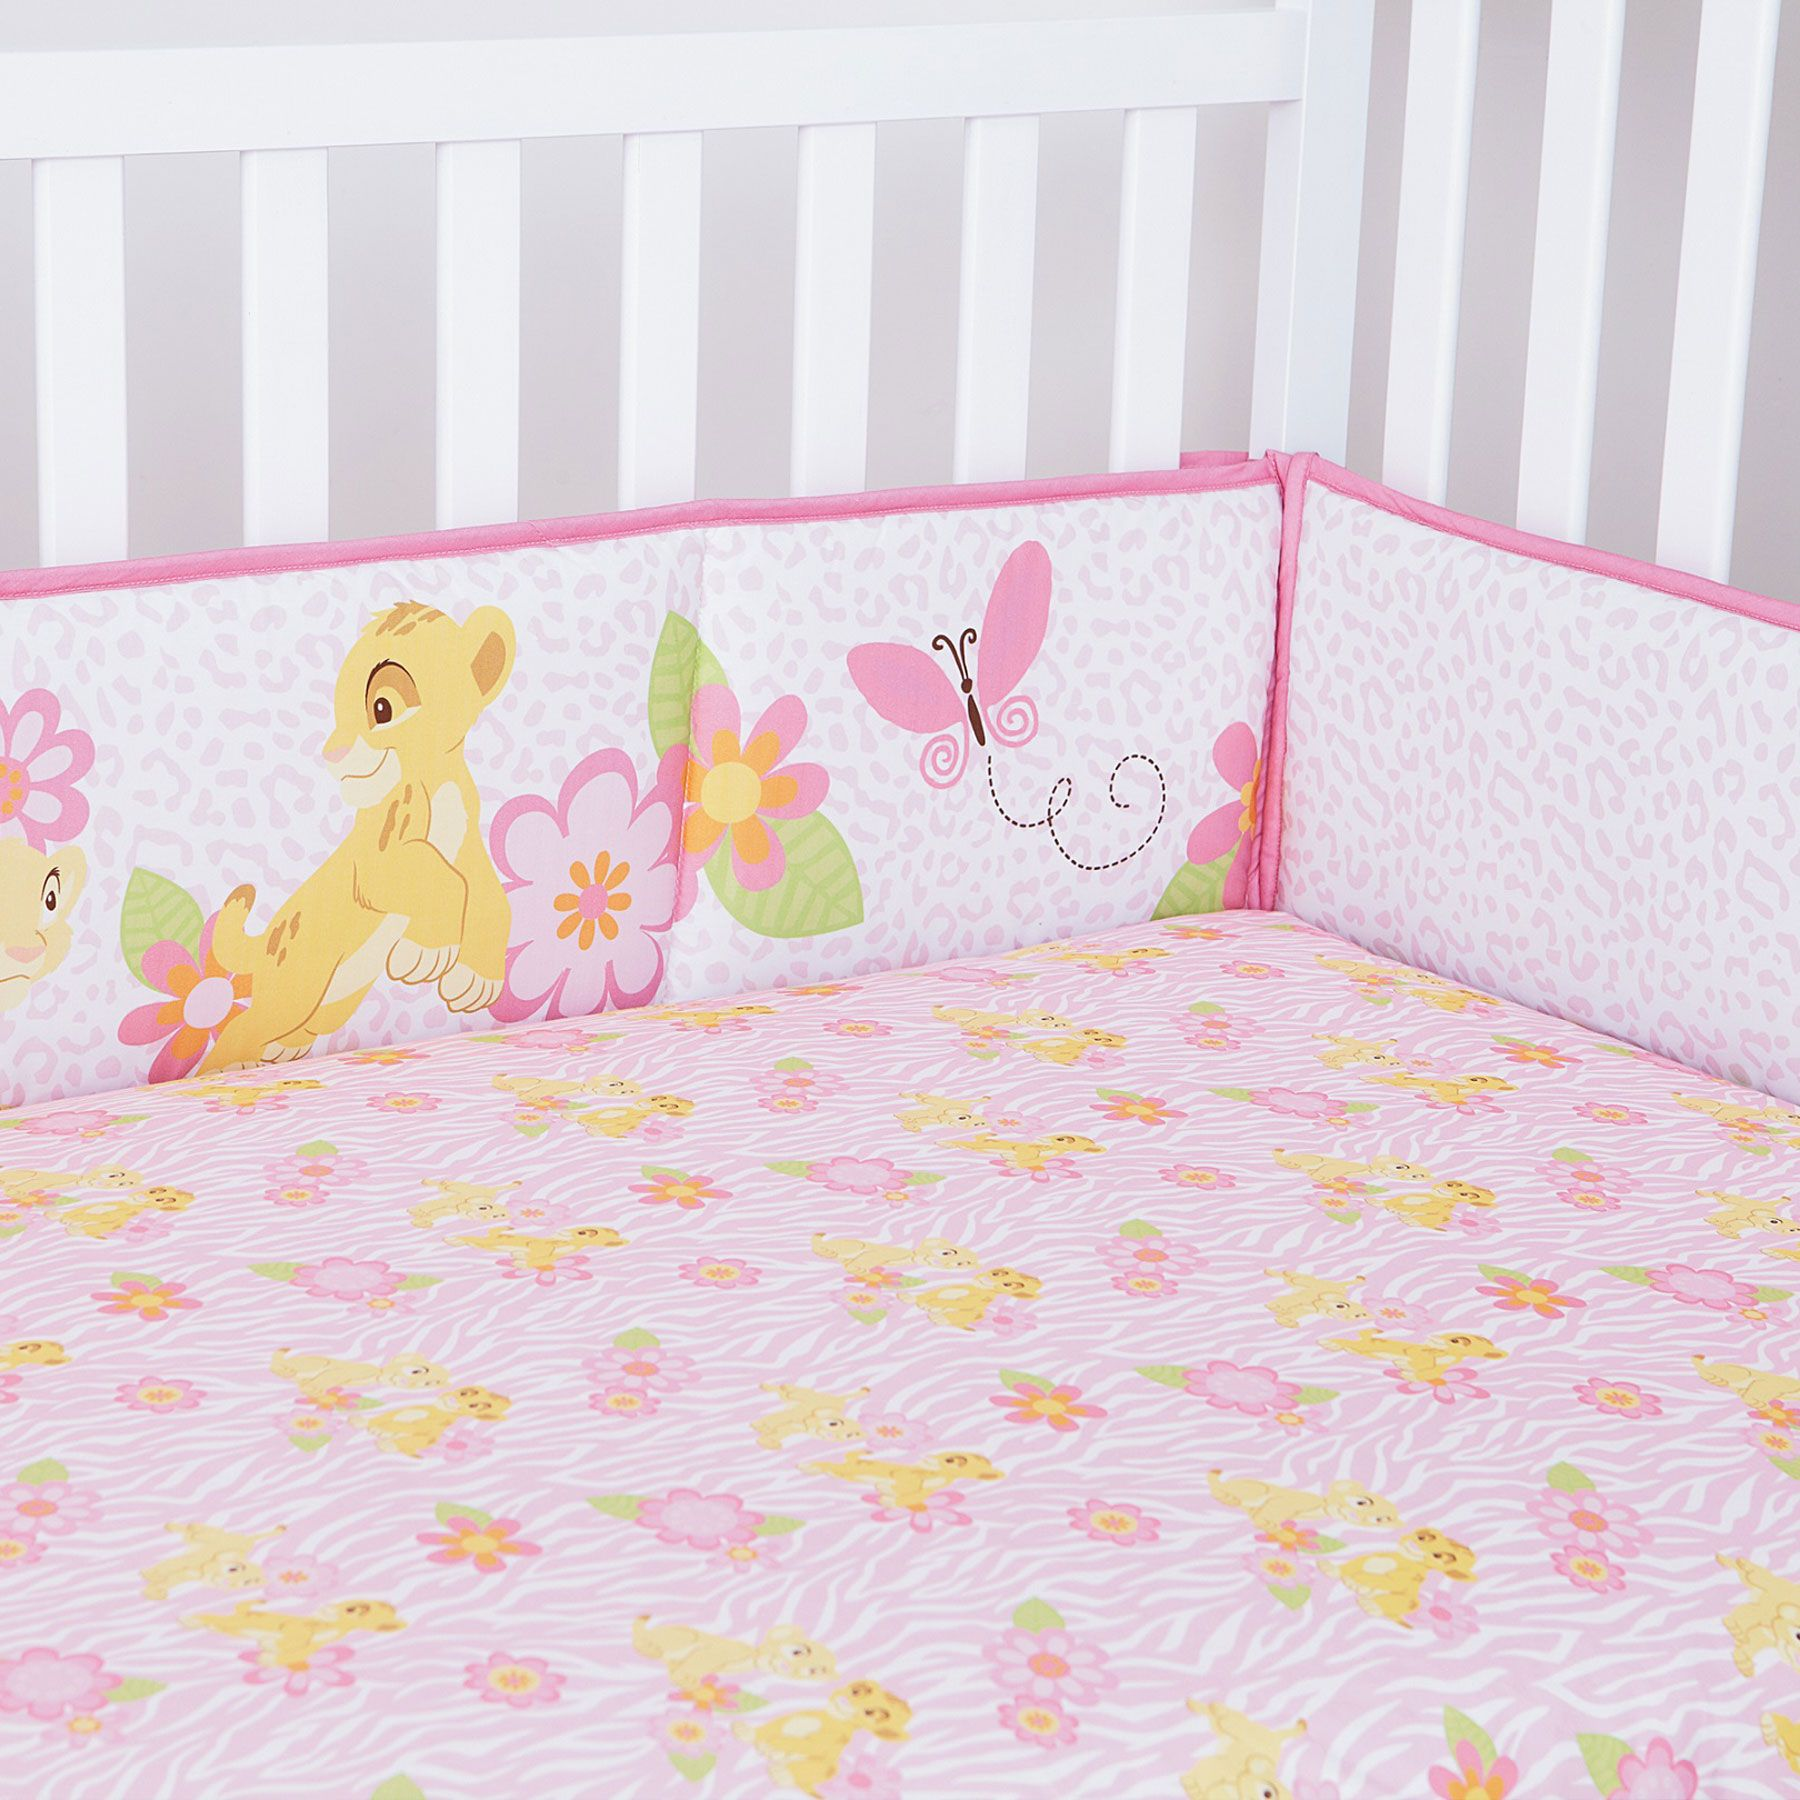 Lion King Bedroom Decorations Lion King Inspired Name Blocks Nala Bedding Pink And White Animal